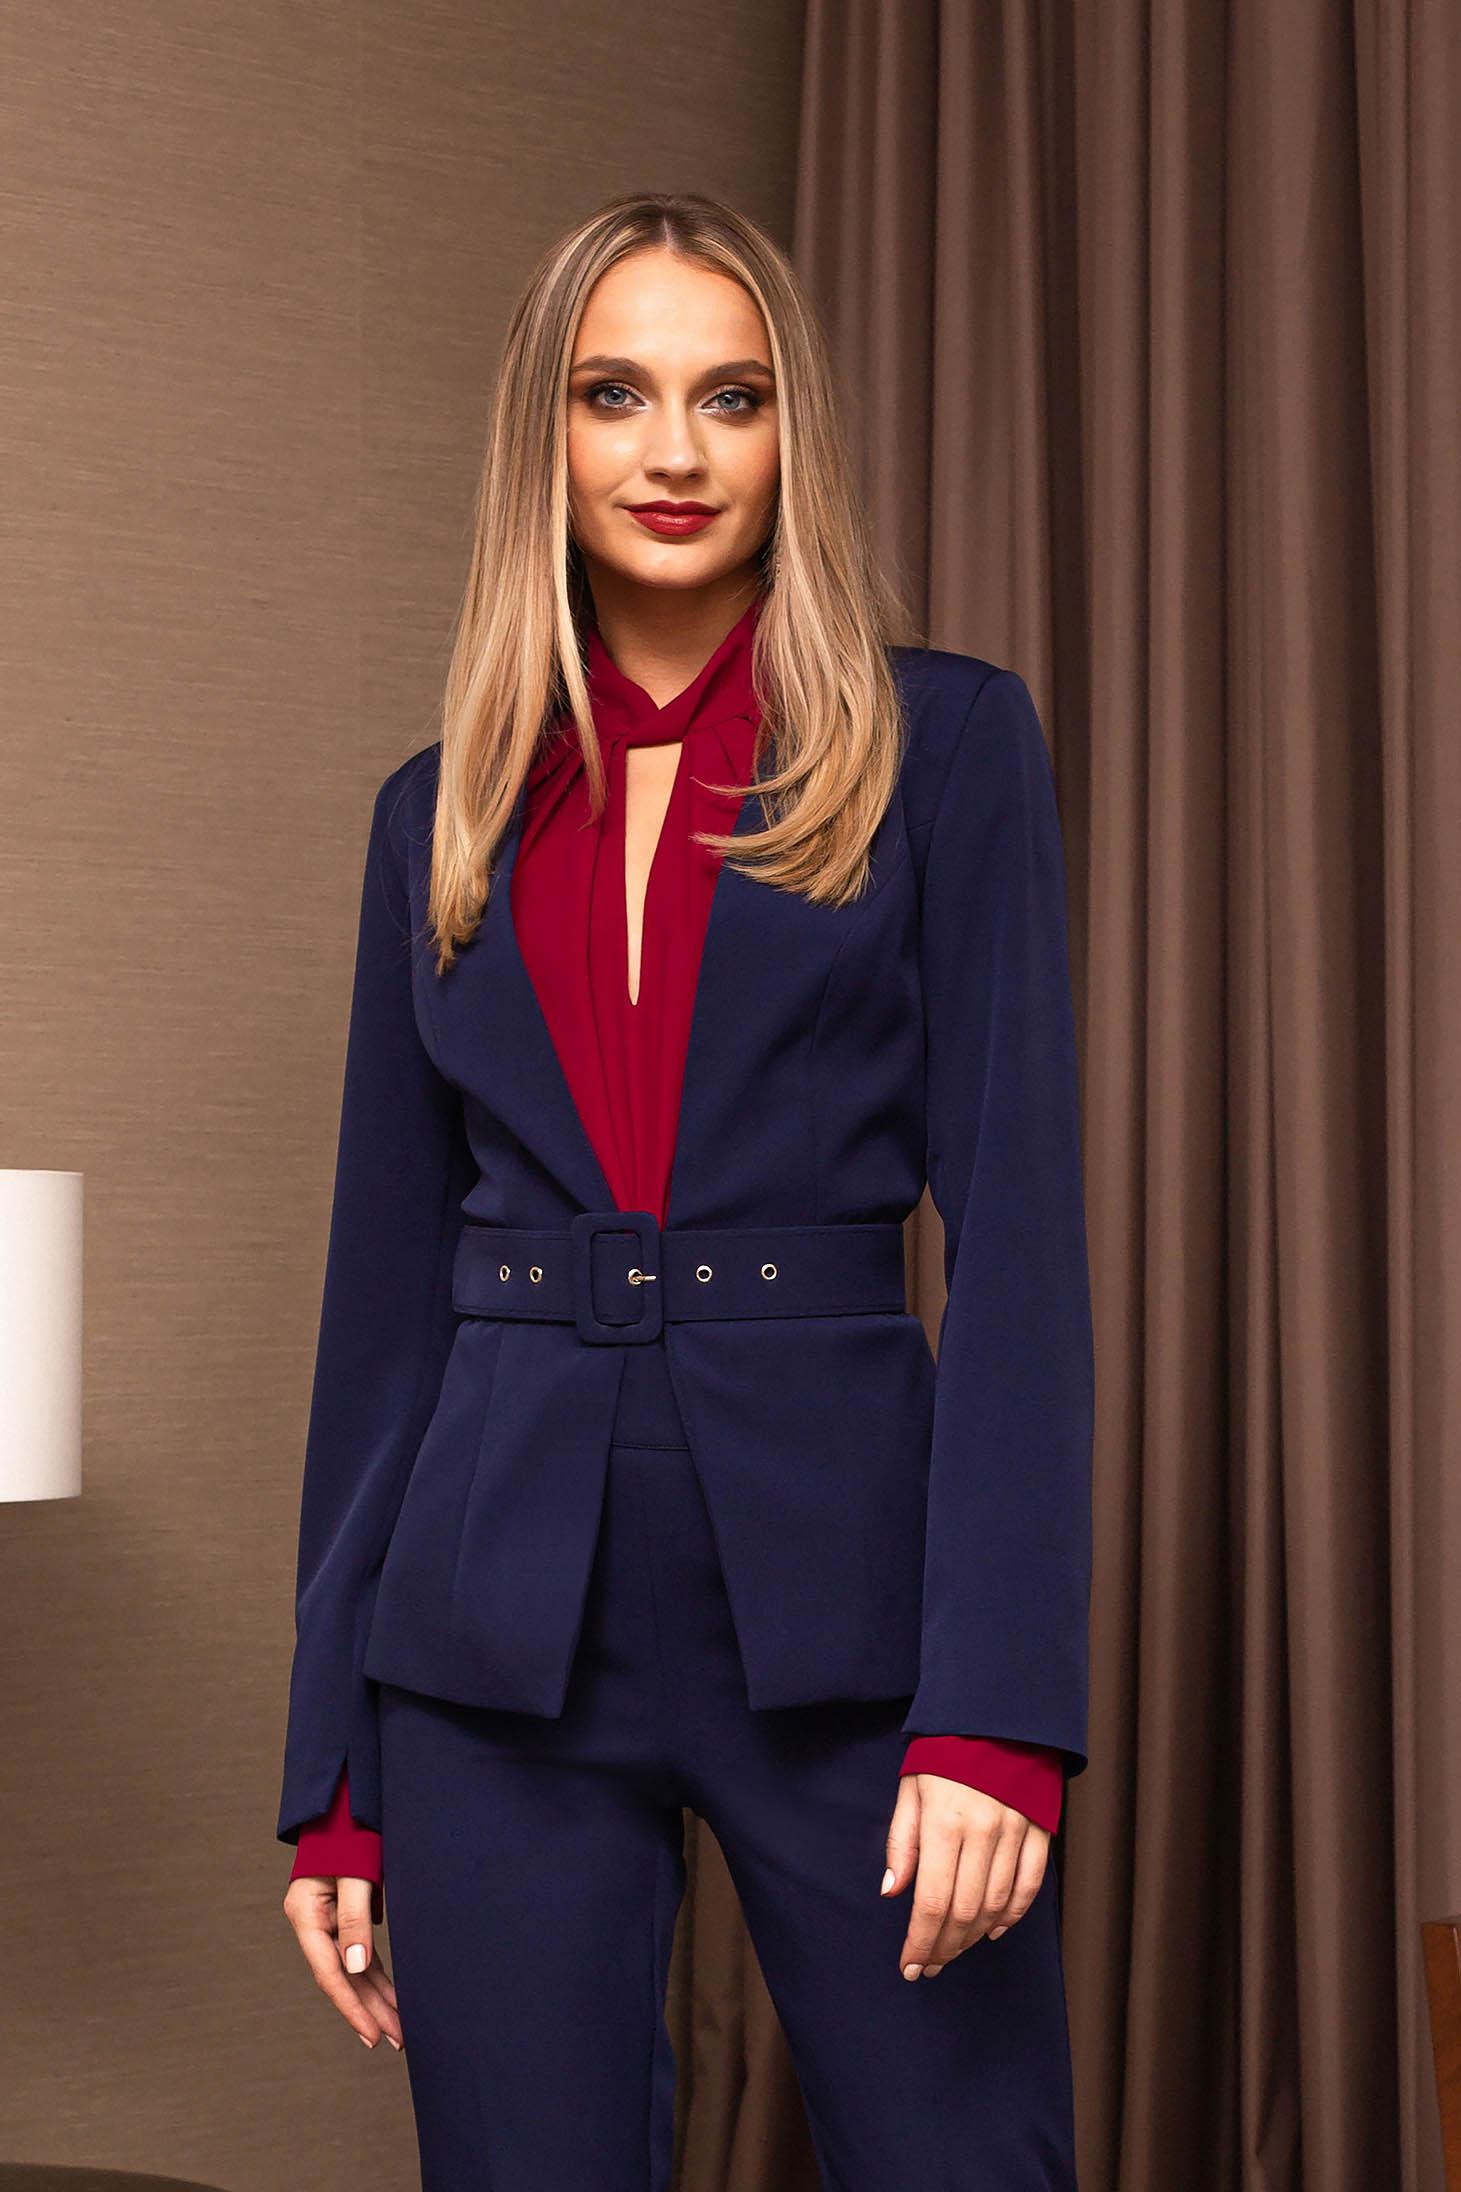 Darkblue jacket elegant blazer accessorized with a waistband short cut long sleeved arched cut